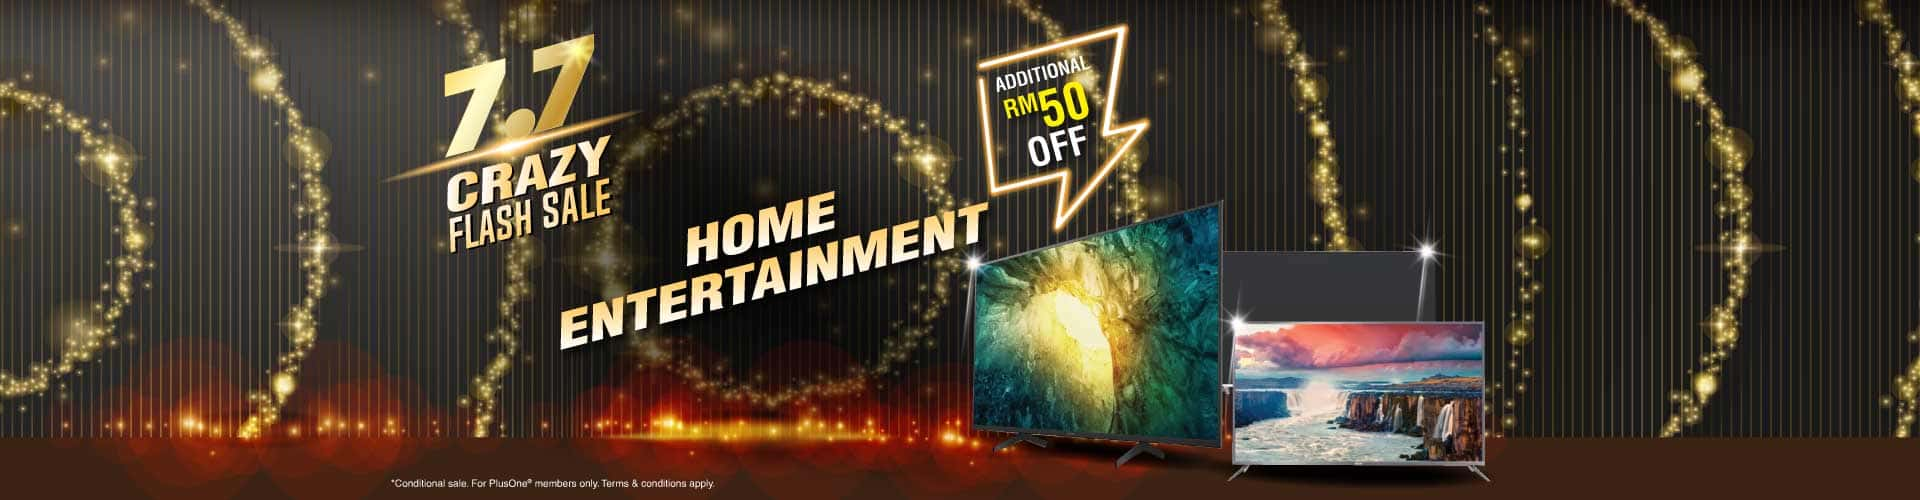 7.7 home entertainment